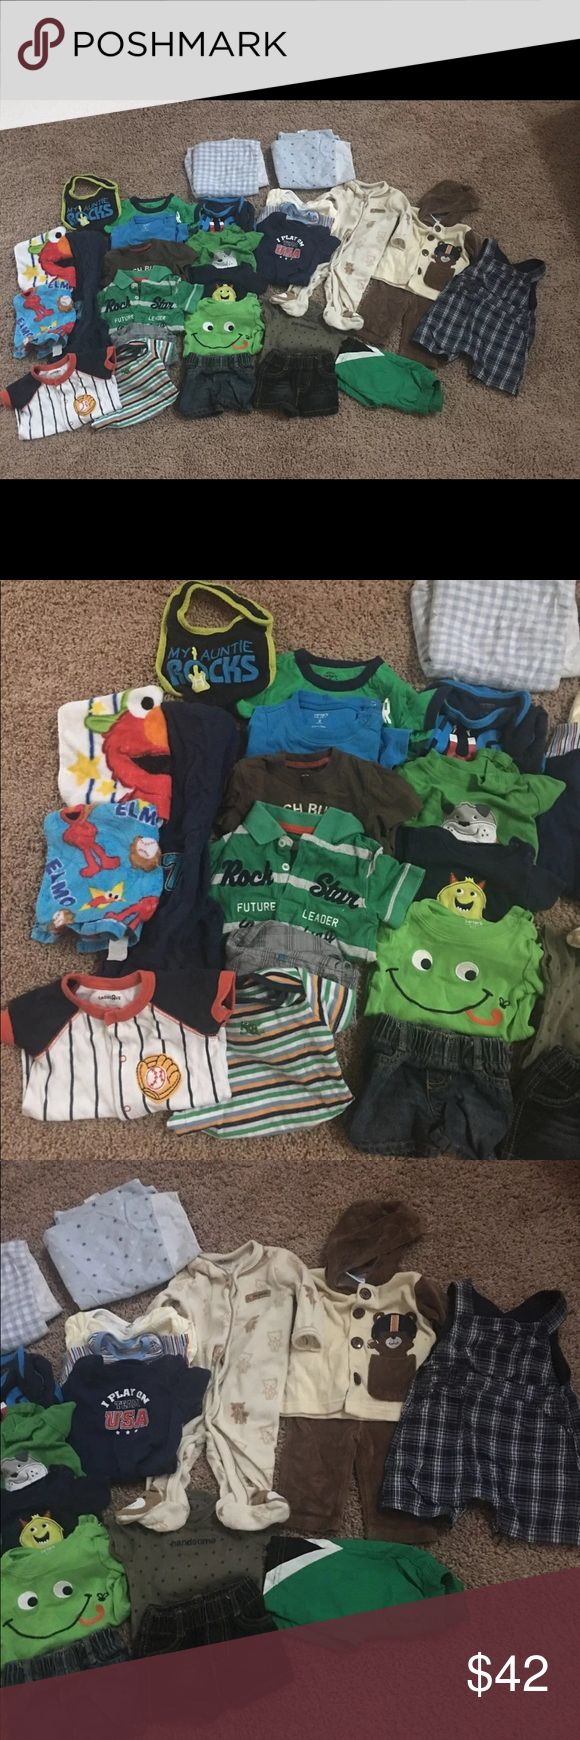 Great Deal!! 39 Piece Clothing Lot 0-6M! Infant boys clothing lot! Great condition! 5 3M onesies 2 3-6M onesies 3 bibs includes 2 elmo bibs!! 2 burp cloths 1 fao Schwarz overalls 0-3M 1 NB jean shorts 1 NB pants 1 3M jean shorts 4 3M tops 1 3-6M zip up hoodie 1 3-6M pants 1 0-3 month fleece onesie 3 0-3M onesies 1 3-6 months fleece shirt and pants set Size 0 flip flops Infant 6m swim trunks 8 hats 0-6 m / 1 infant hand protectors Brands include: carters, child of mine, gerber, Fao schwarz…